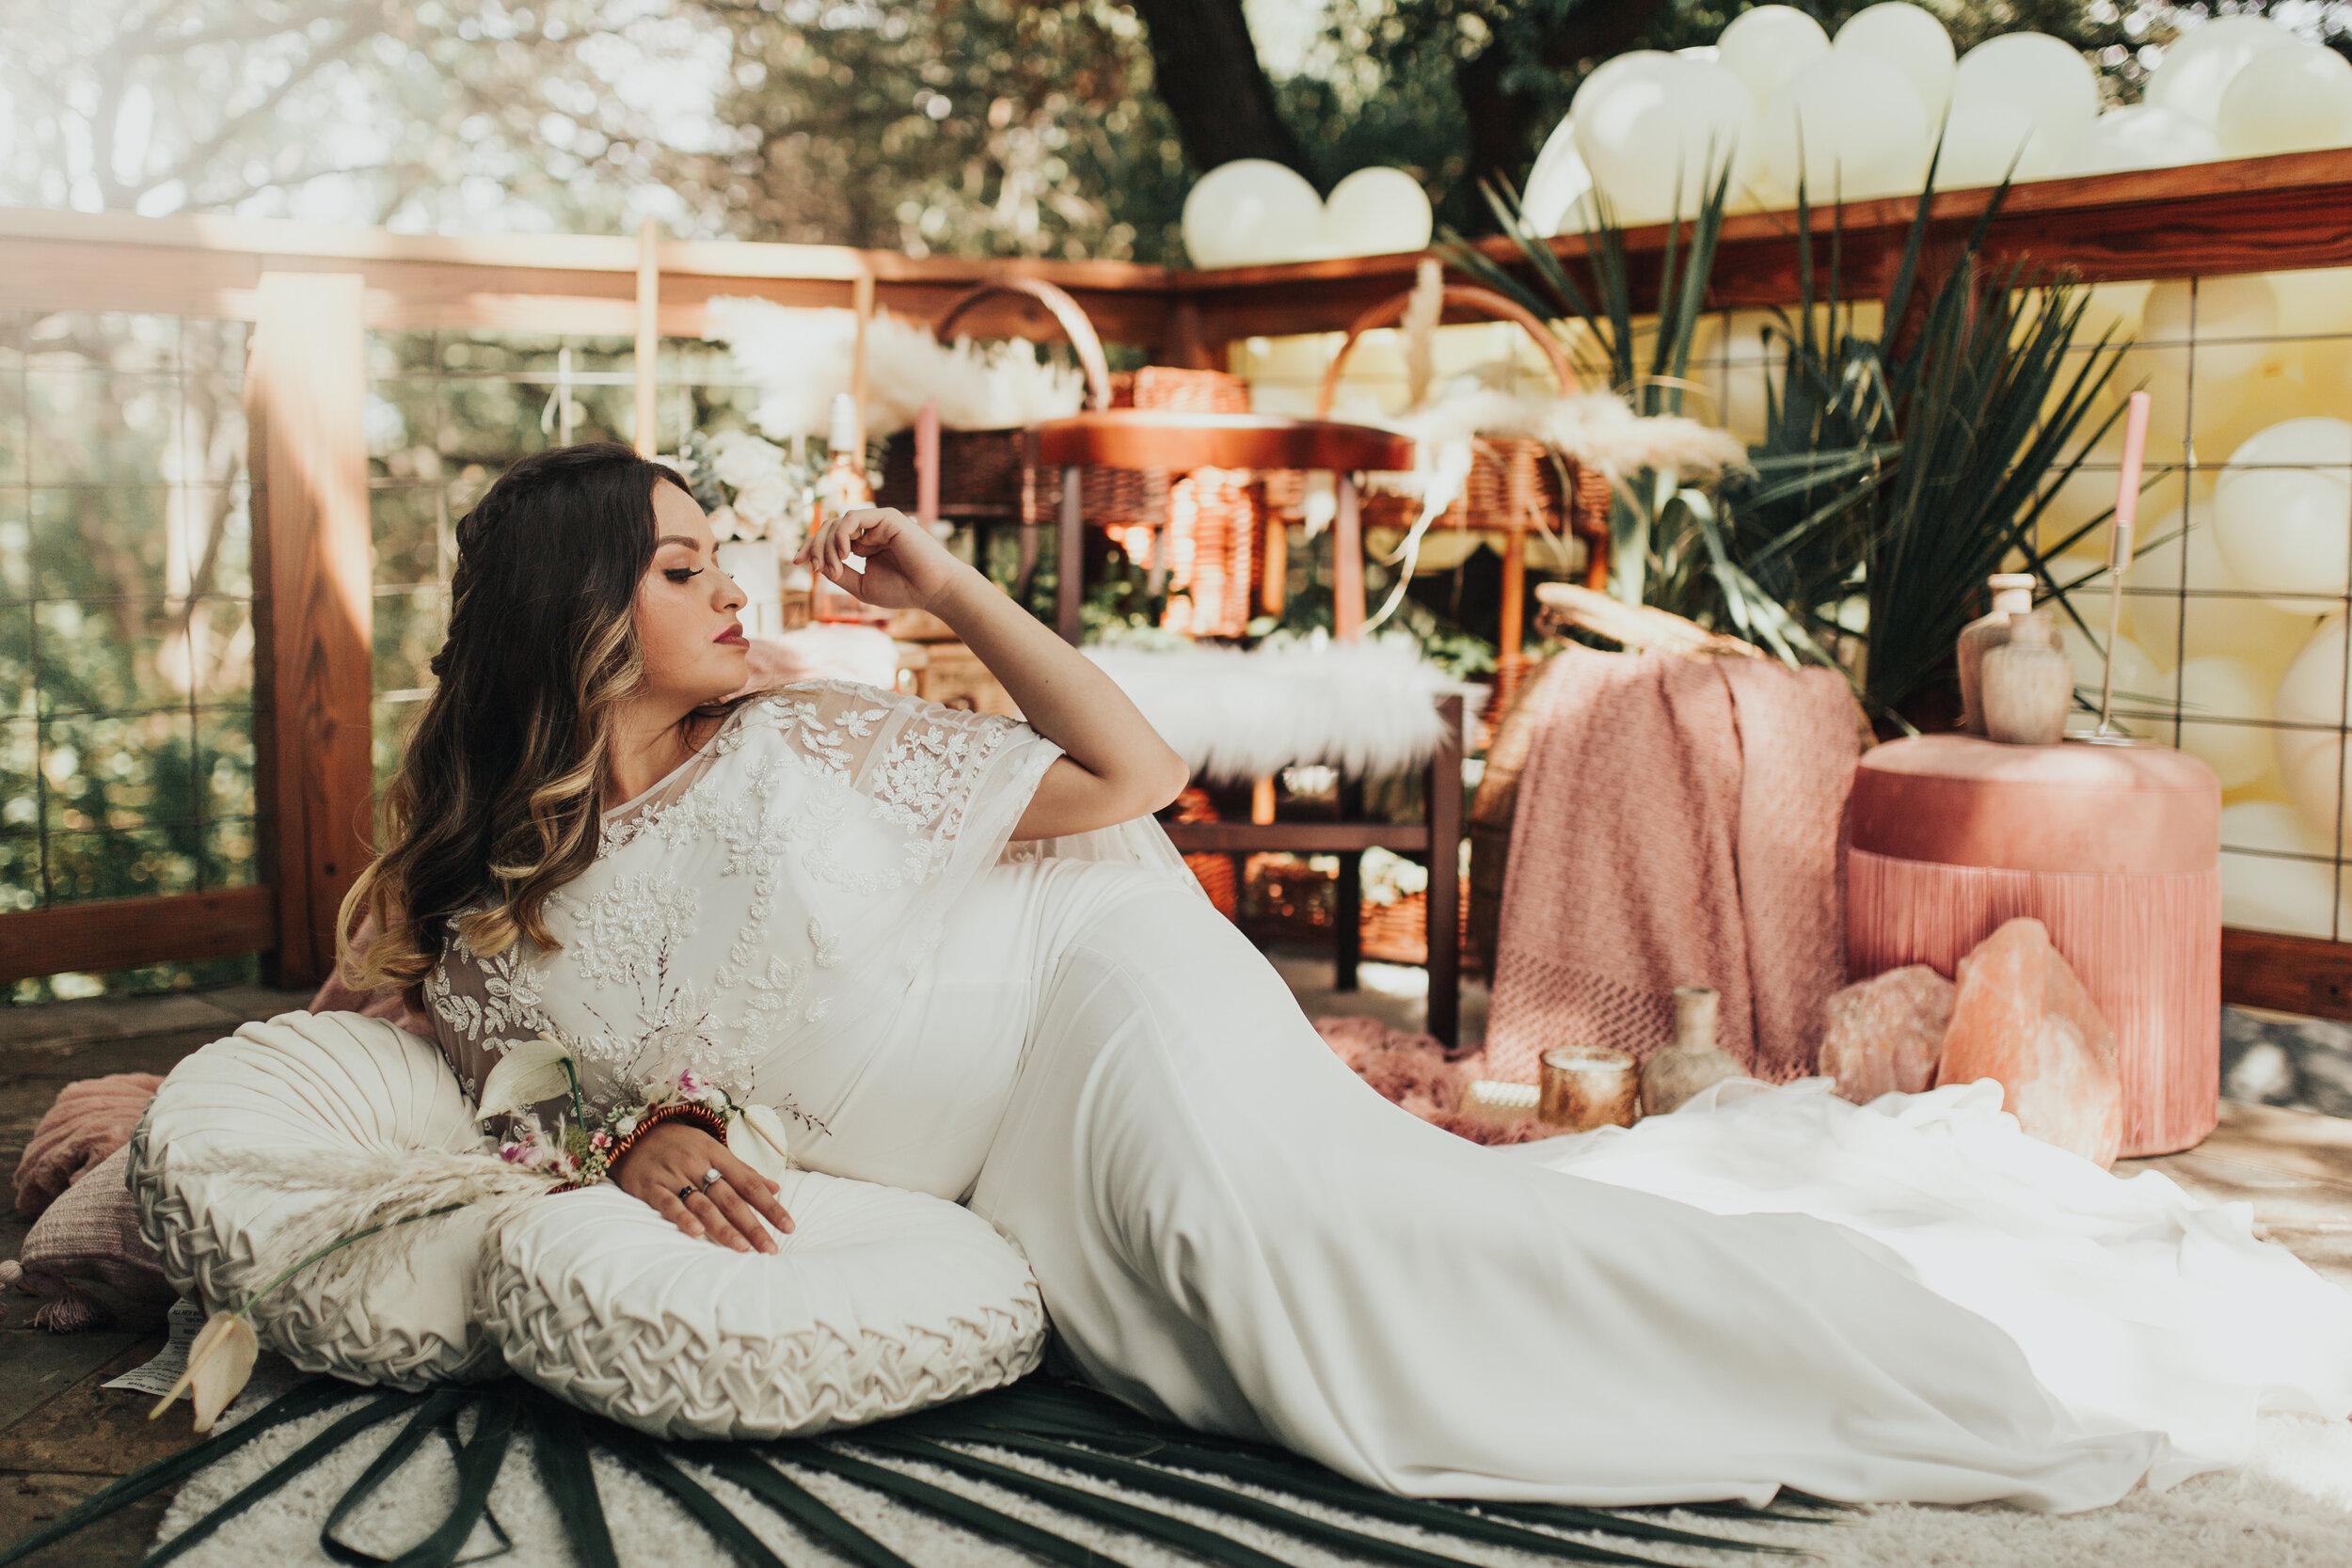 Boho wedding Inspiration Shoot  ↠  The Sanctuary Event Space